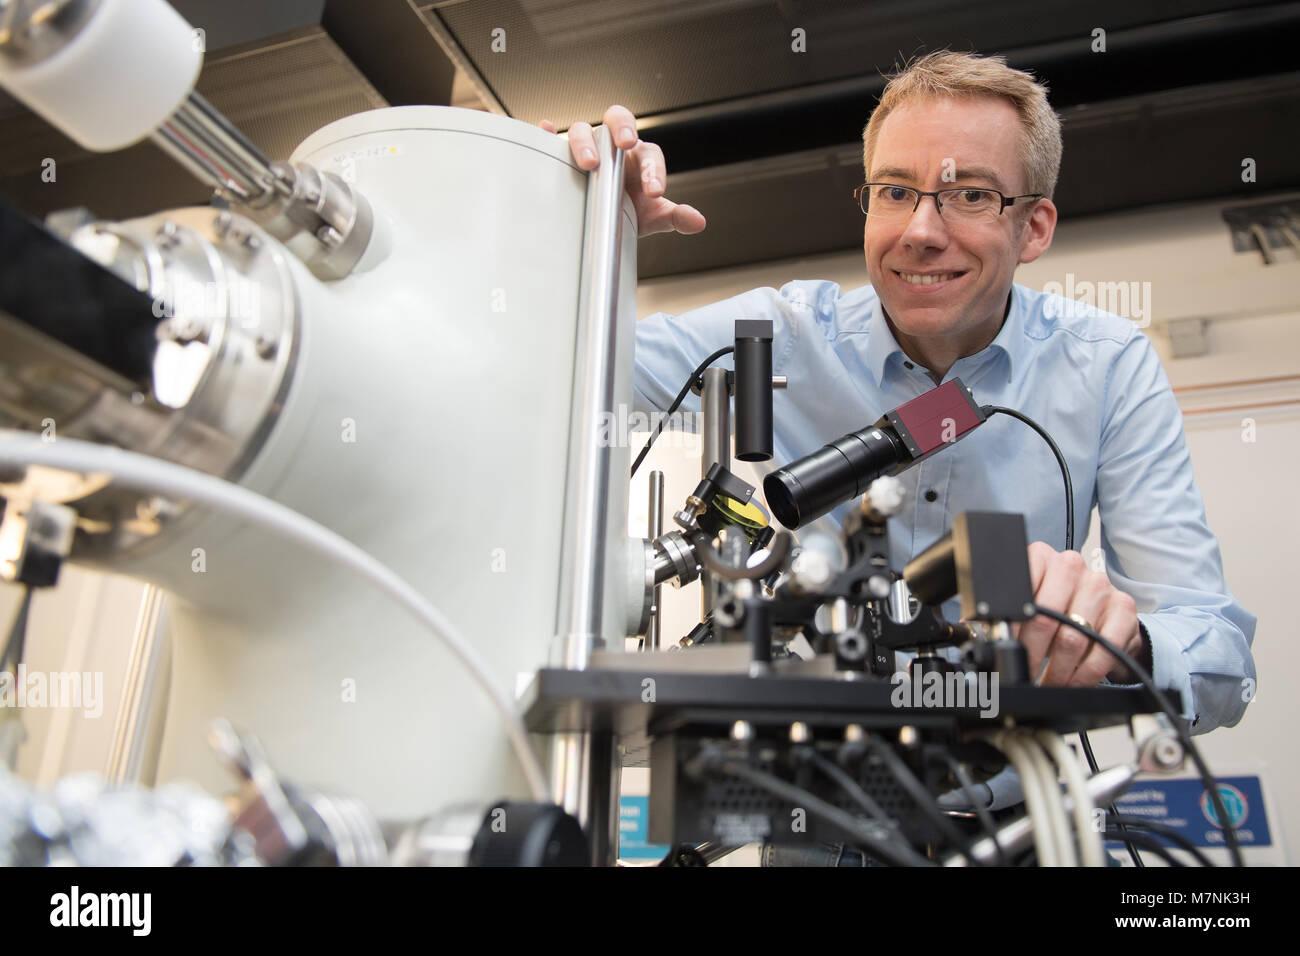 FILED - 21 December 2017, Germany, Goettingen: Claus Ropers, physics professor at the University of Goettingen, - Stock Image